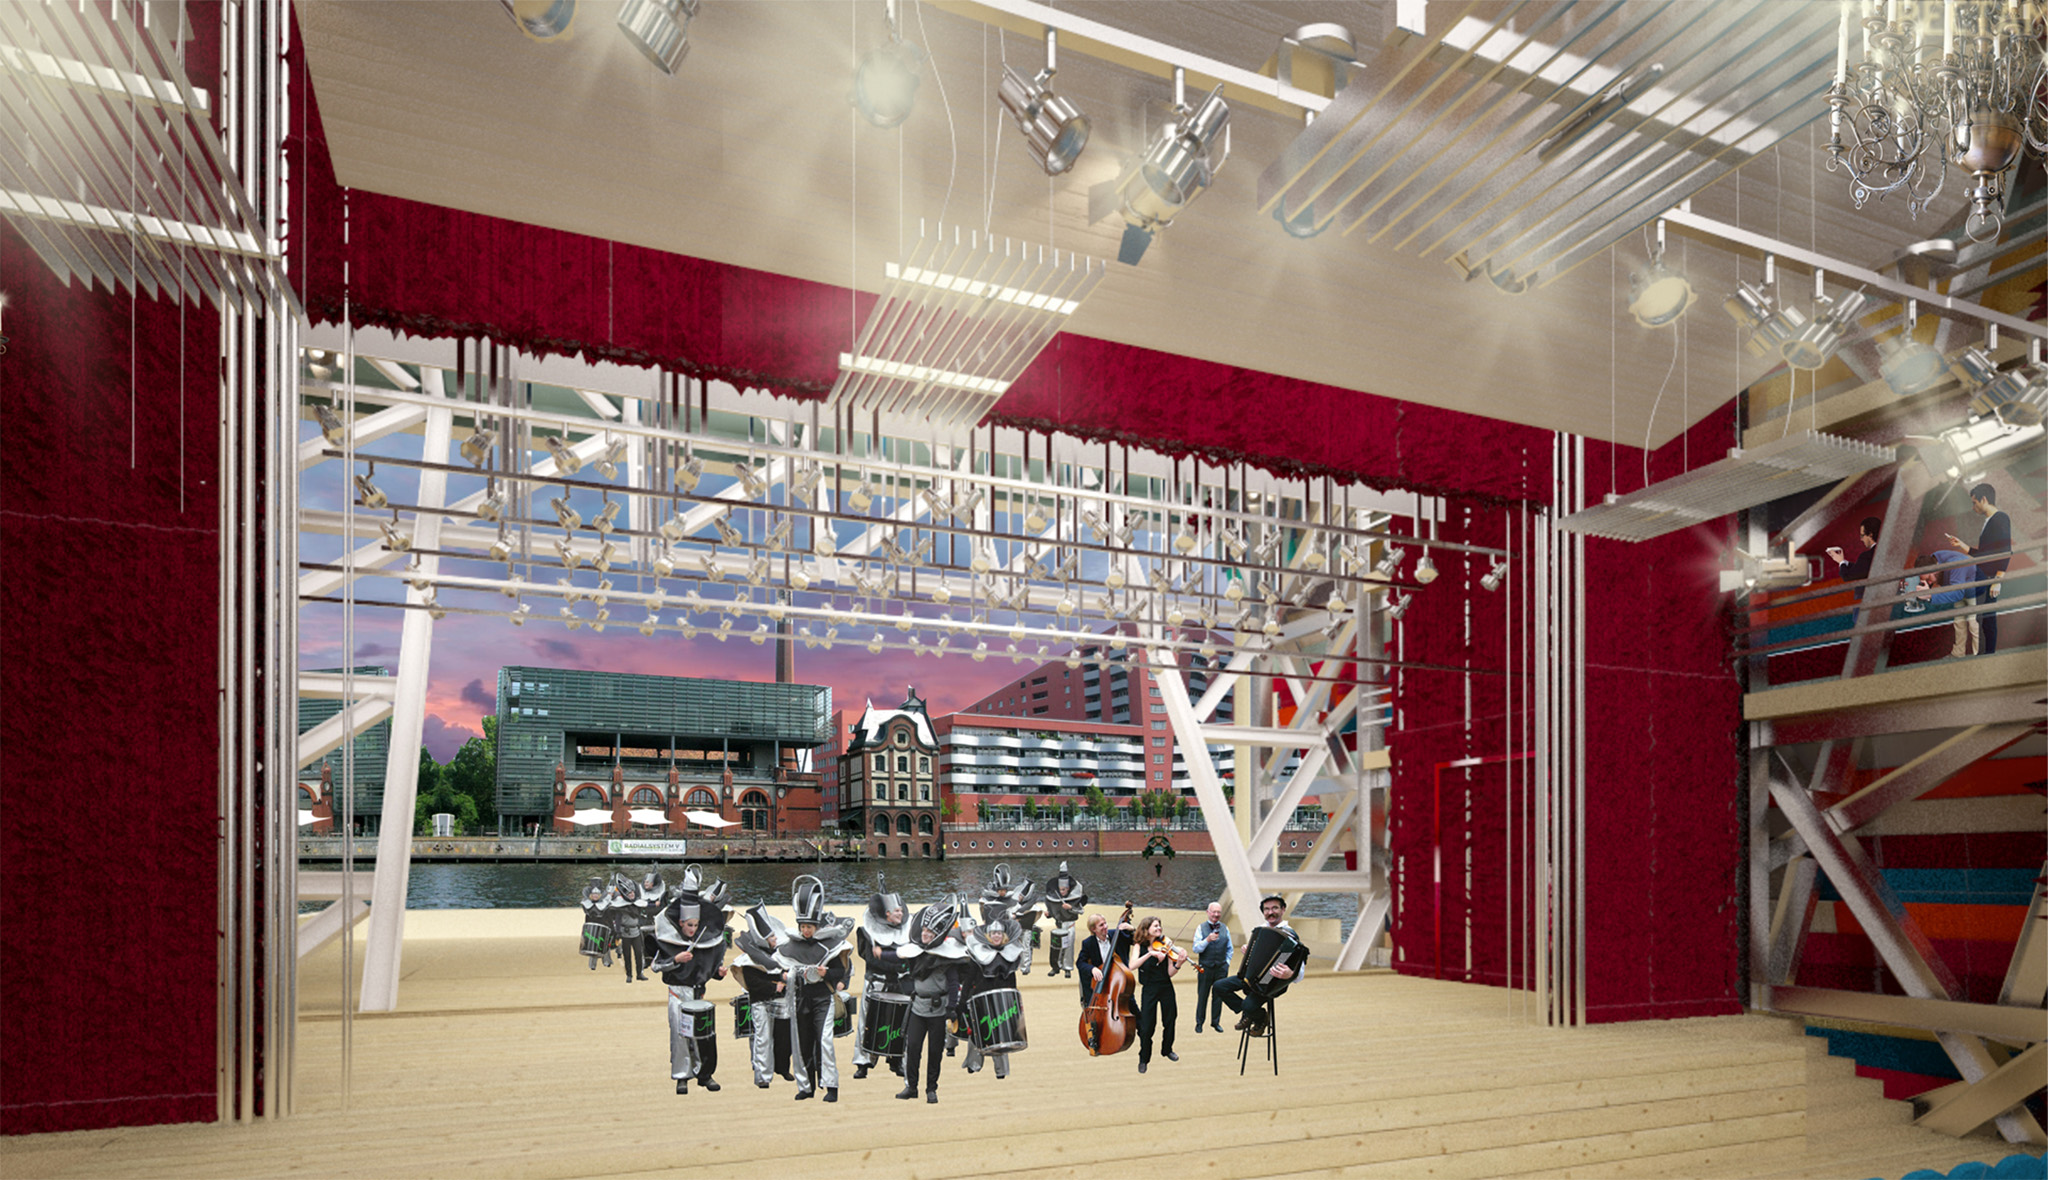 проект архитектура театр в берлине